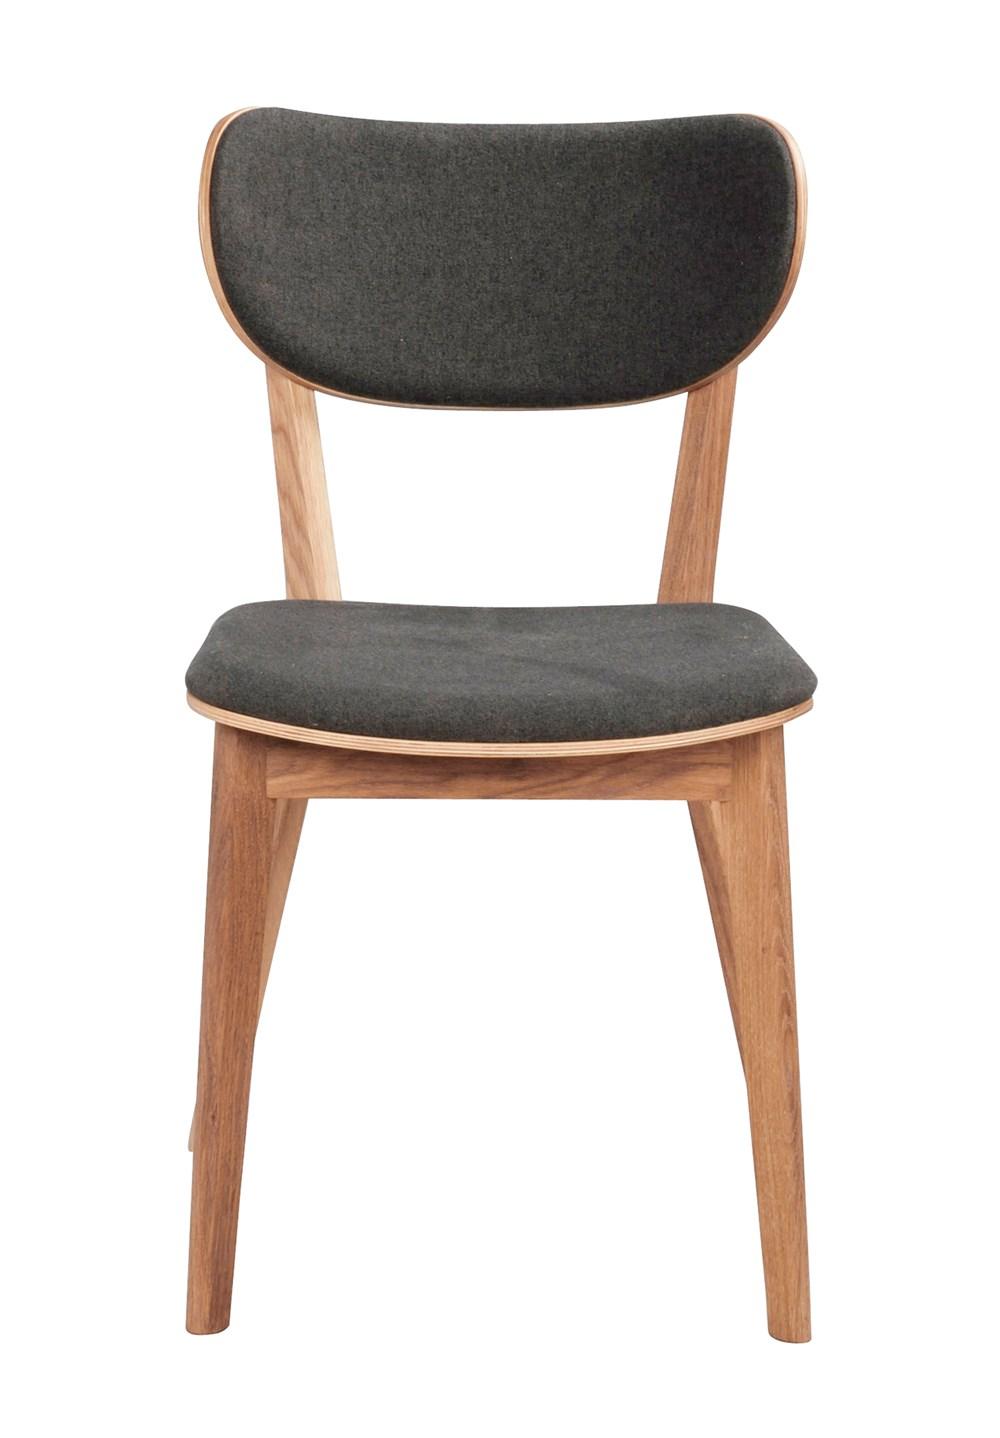 Kato tuoli lakattu tammi / tummanharmaa, Rowico